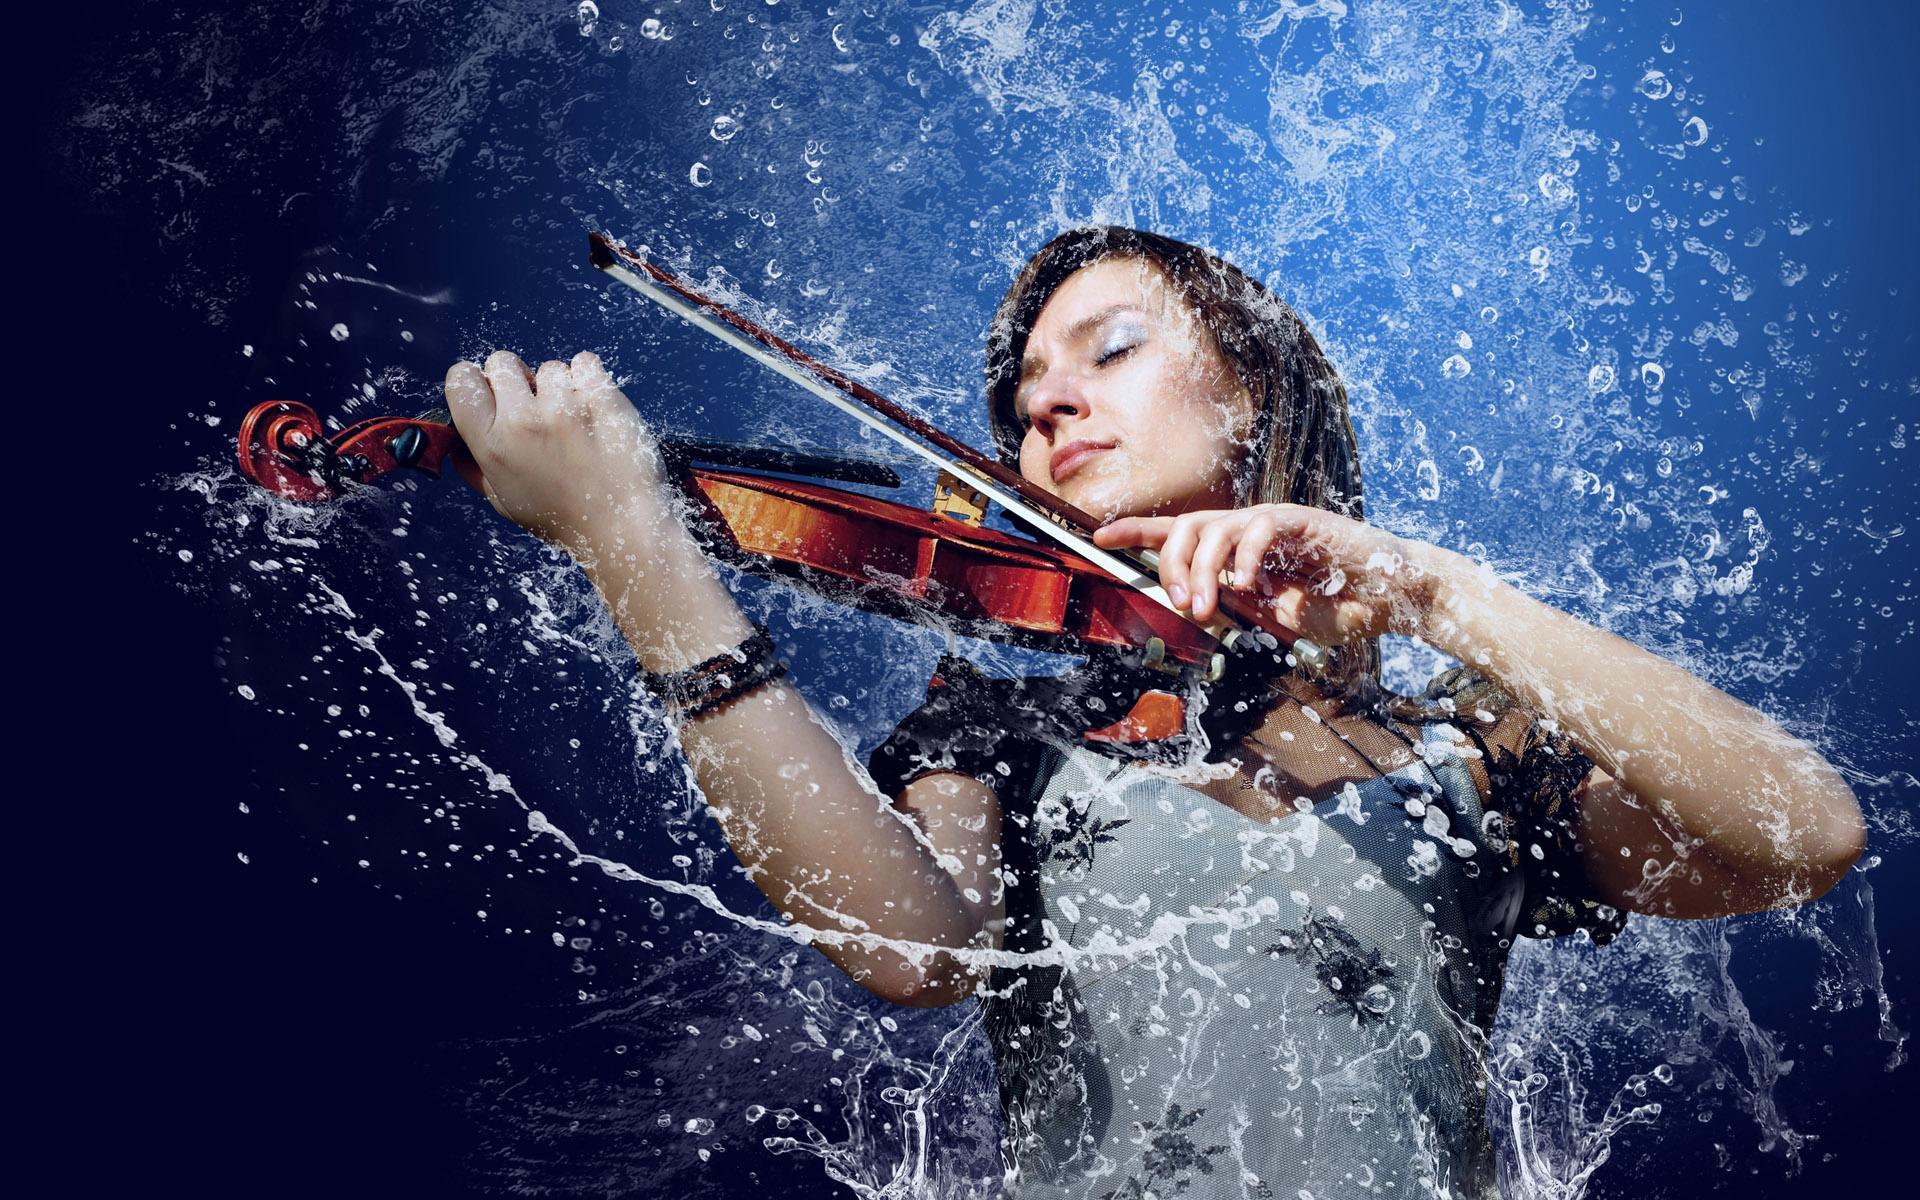 Игра на скрипке обои для рабочего стола, картинки, фото ...: http://hq-wallpapers.ru/wallpapers/music/pic65773_raz1920x1200